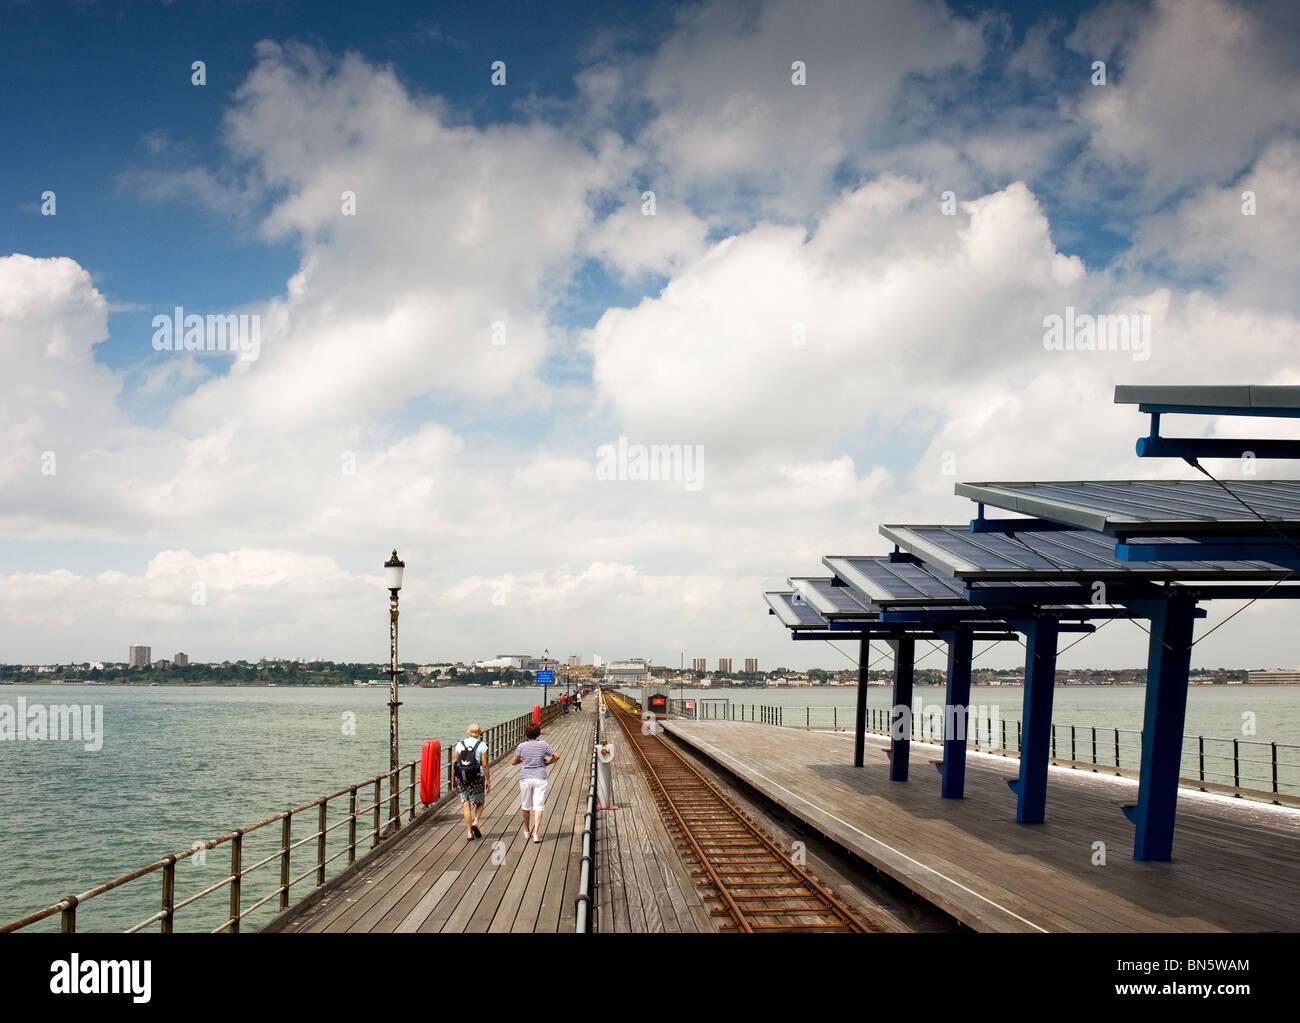 People walking on Southend Pier in Essex - the longest pier in the world. - Stock Image